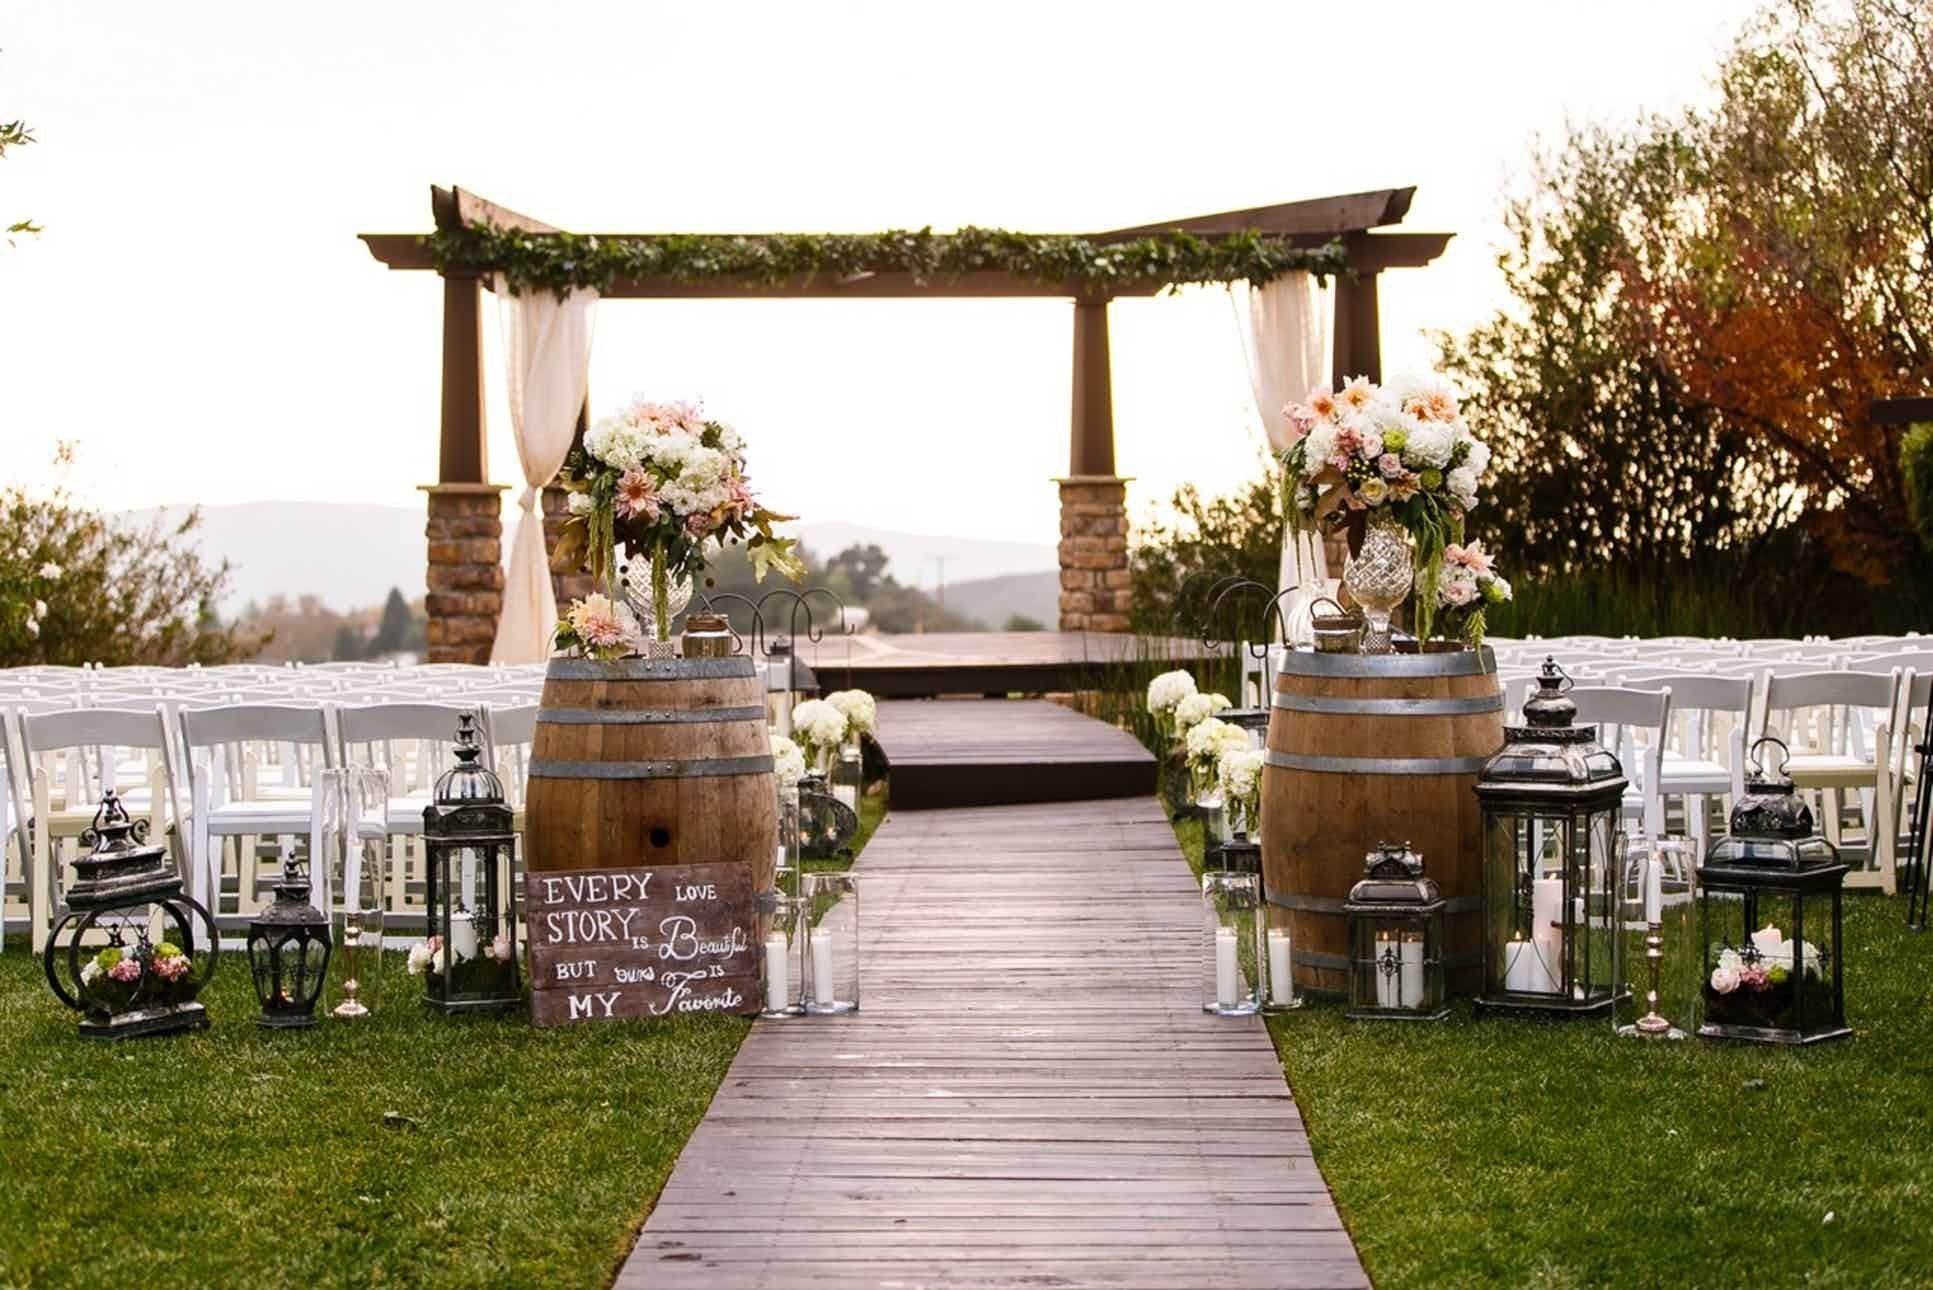 Serendipity Oak Glen Inland Empire Wedding Venue Oak Glen Ca 92399 Serendipity Garden Weddings Garden Wedding Venue Serendipity Oak Glen